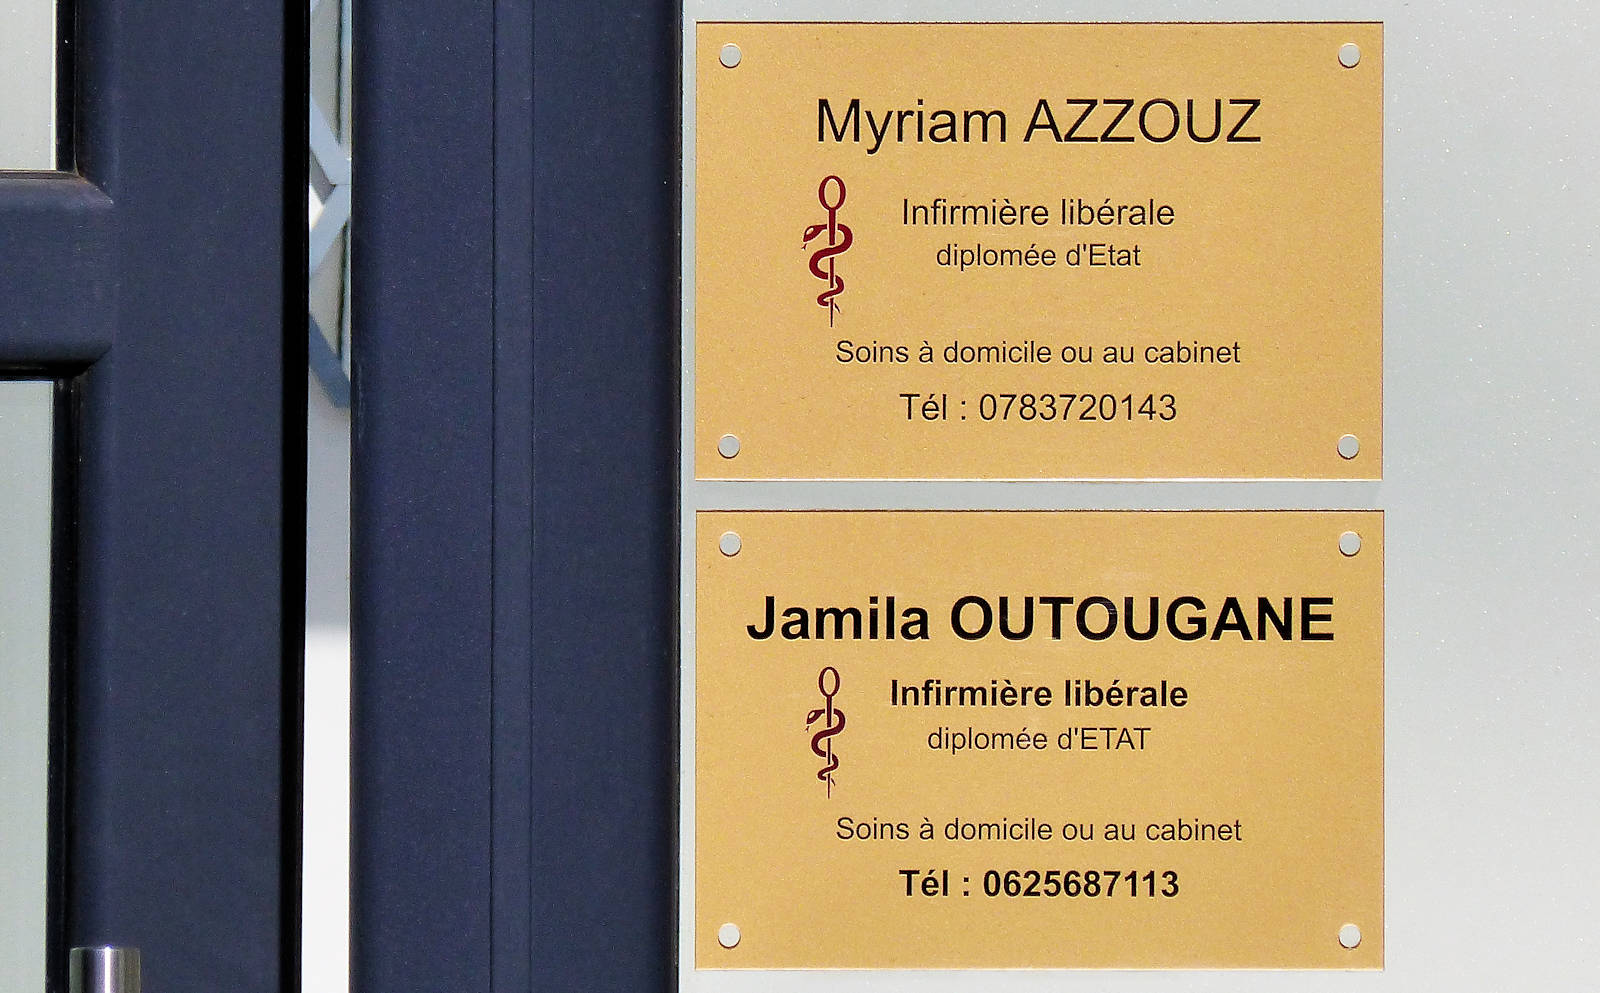 Infirmières Azzouz et Outougane, Tourcoing Croix-Rouge.